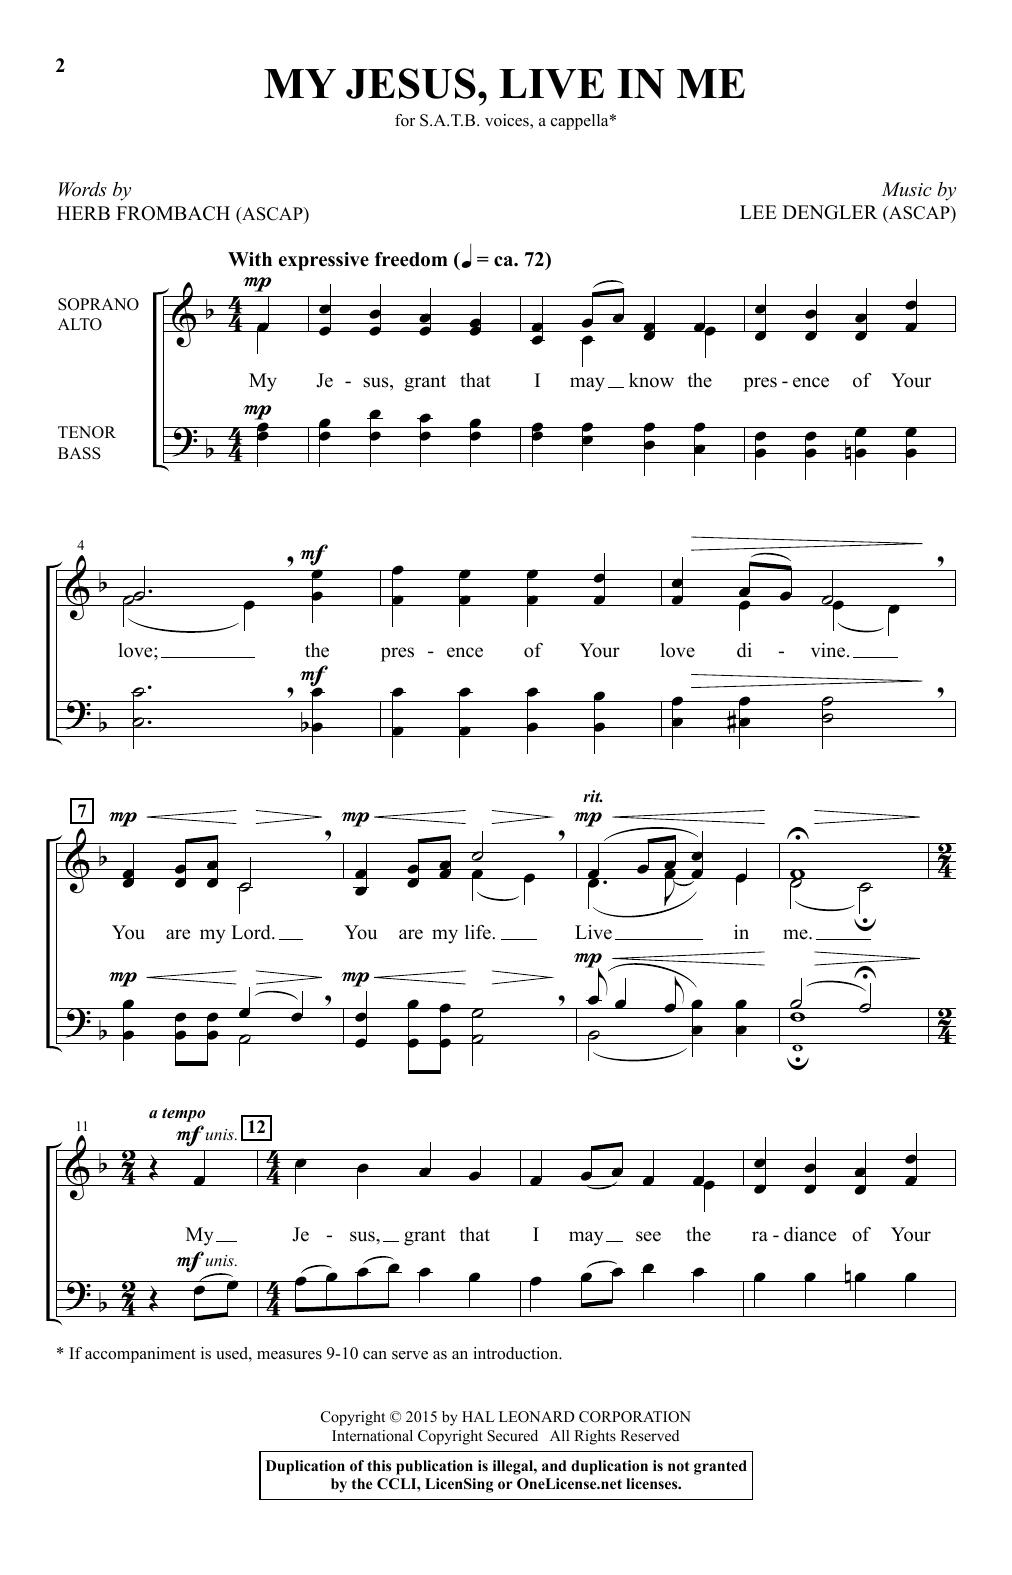 Lee Dengler My Jesus, Live In Me sheet music notes and chords. Download Printable PDF.